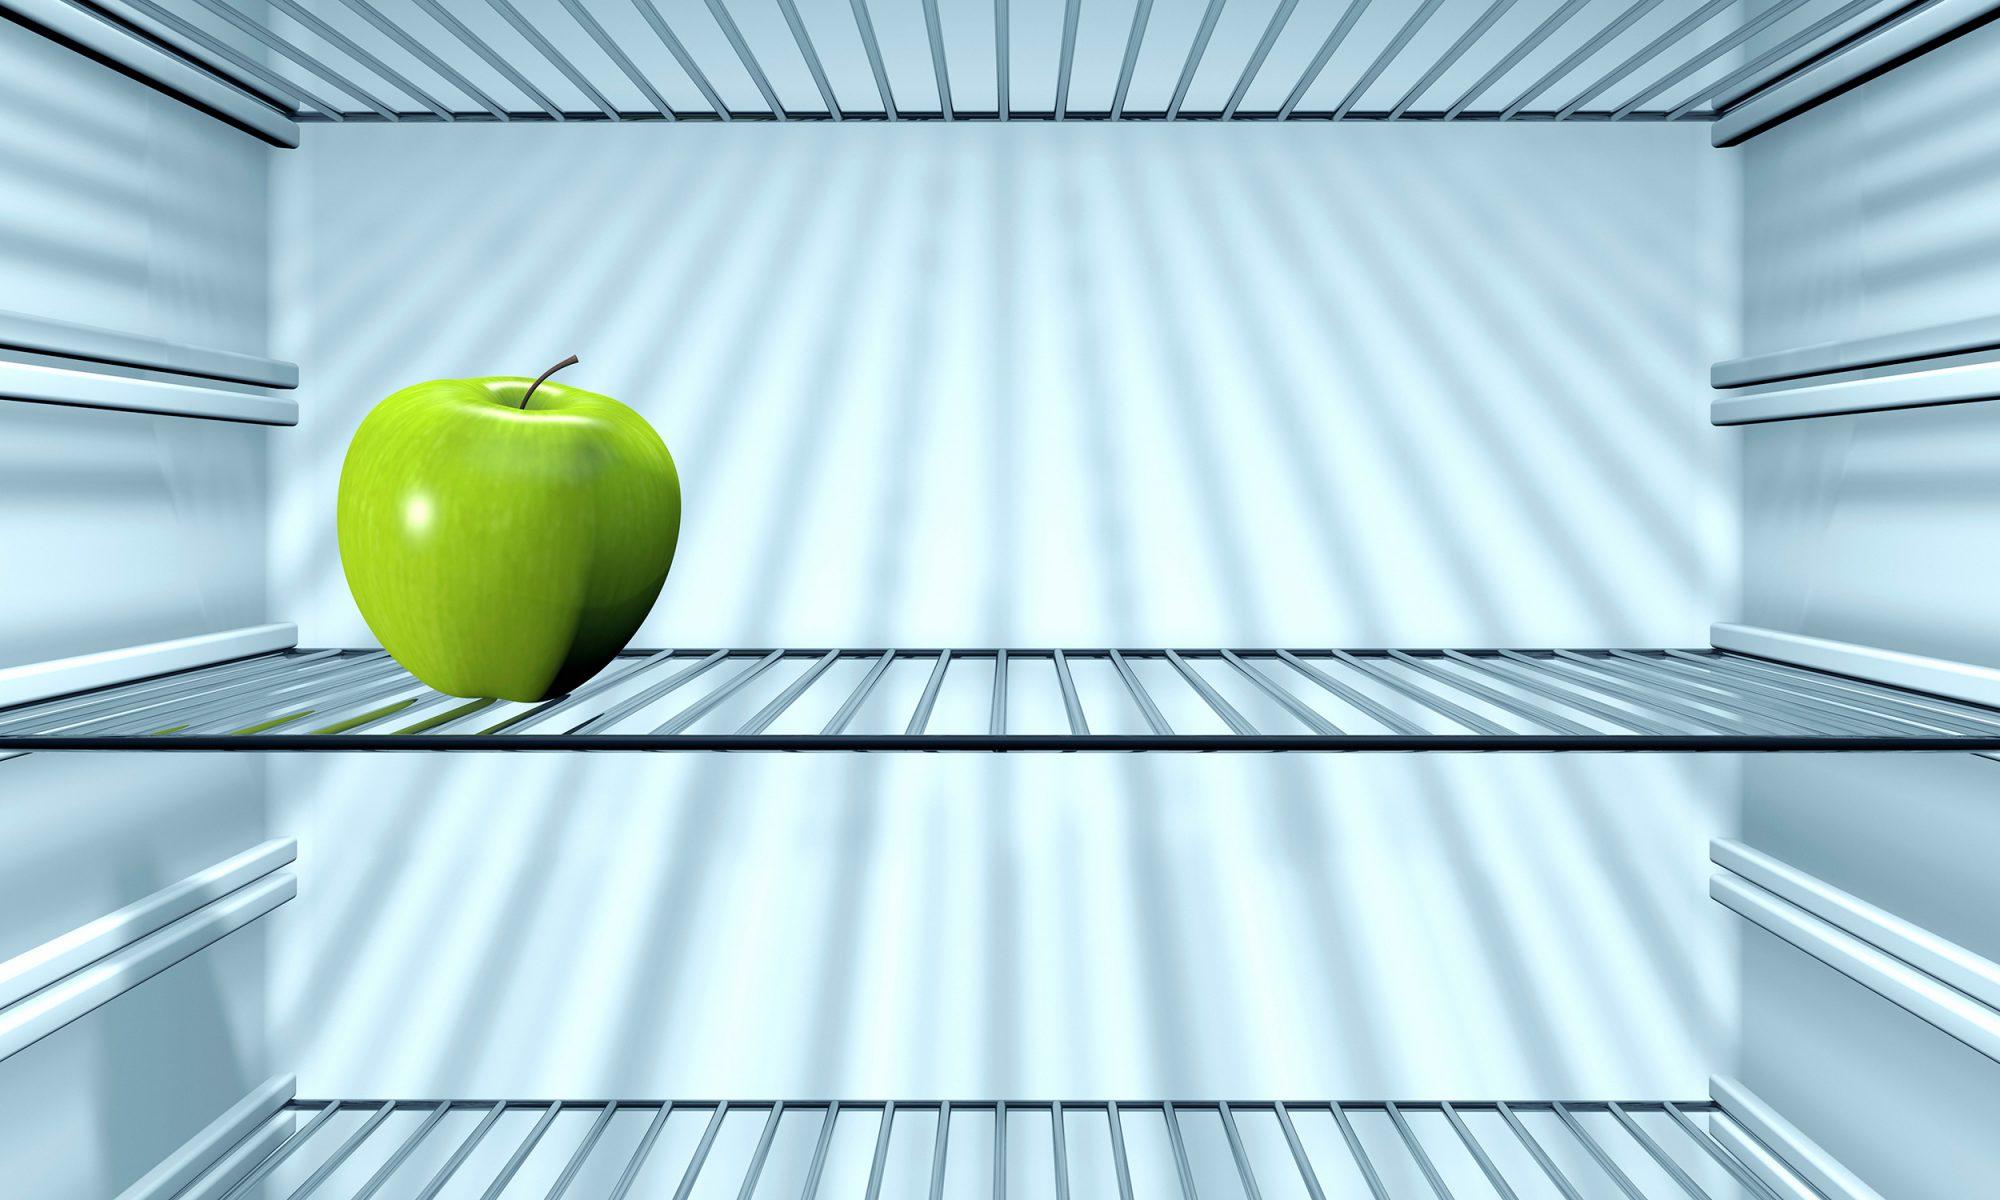 EC: Should You Keep Fruit in the Fridge?